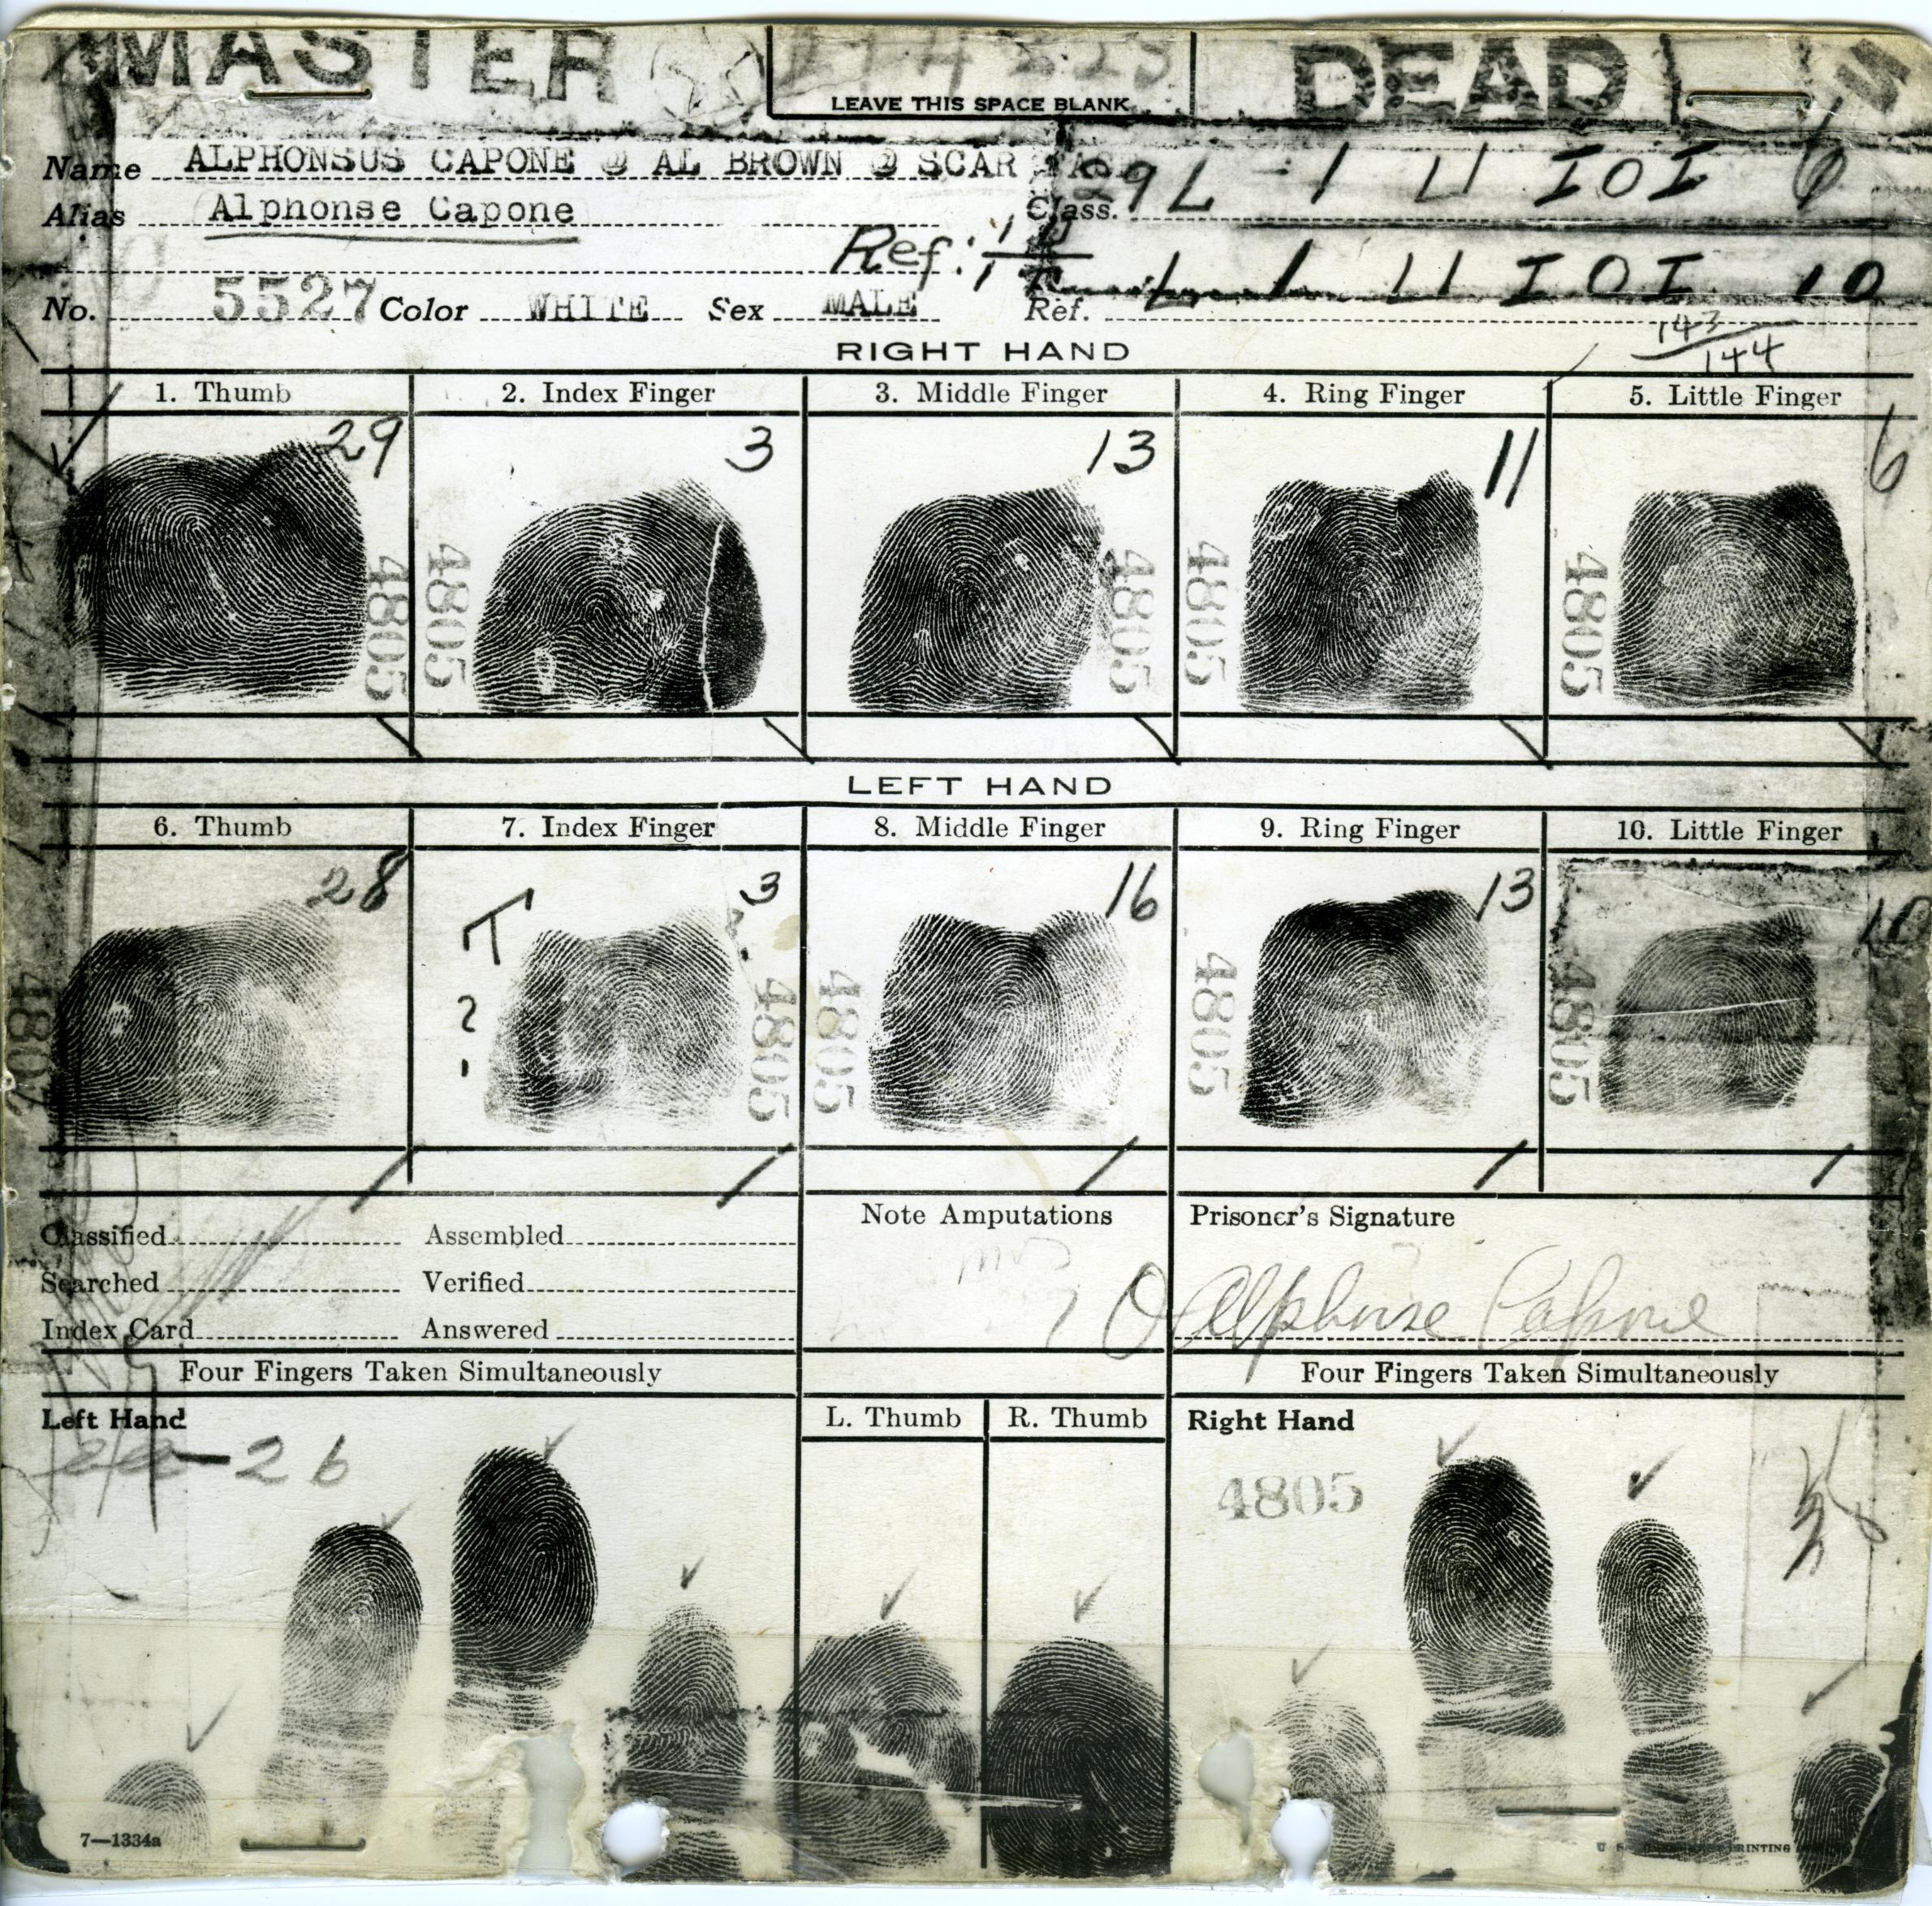 Al Capone's Fingerprint Card